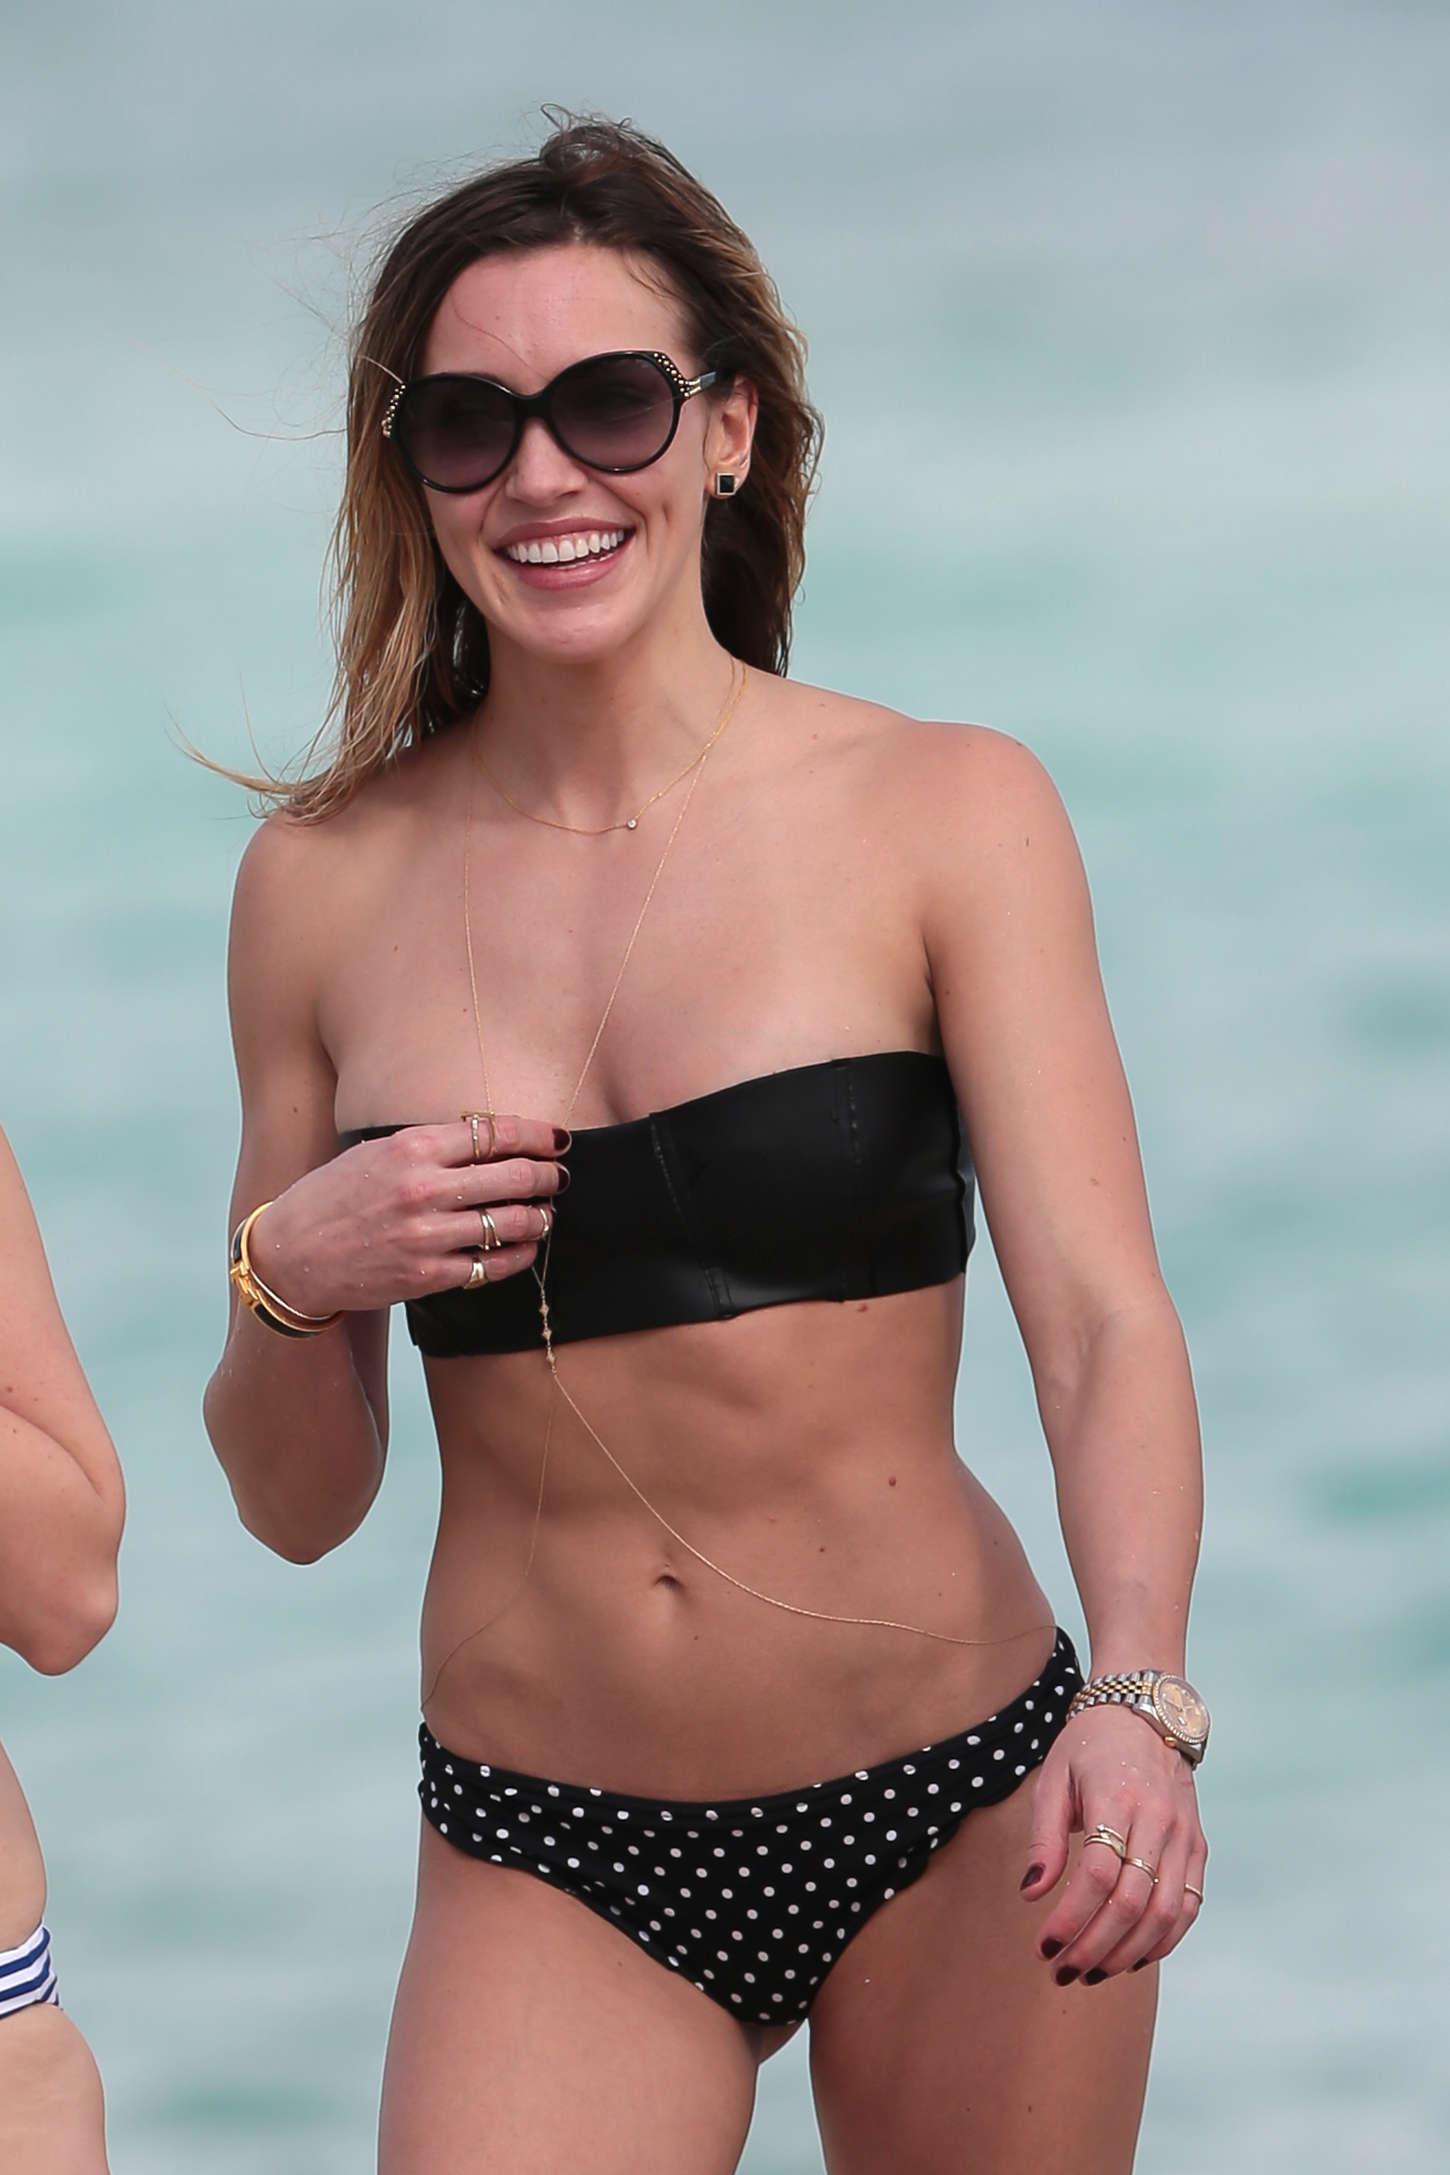 Katie curic en bikini